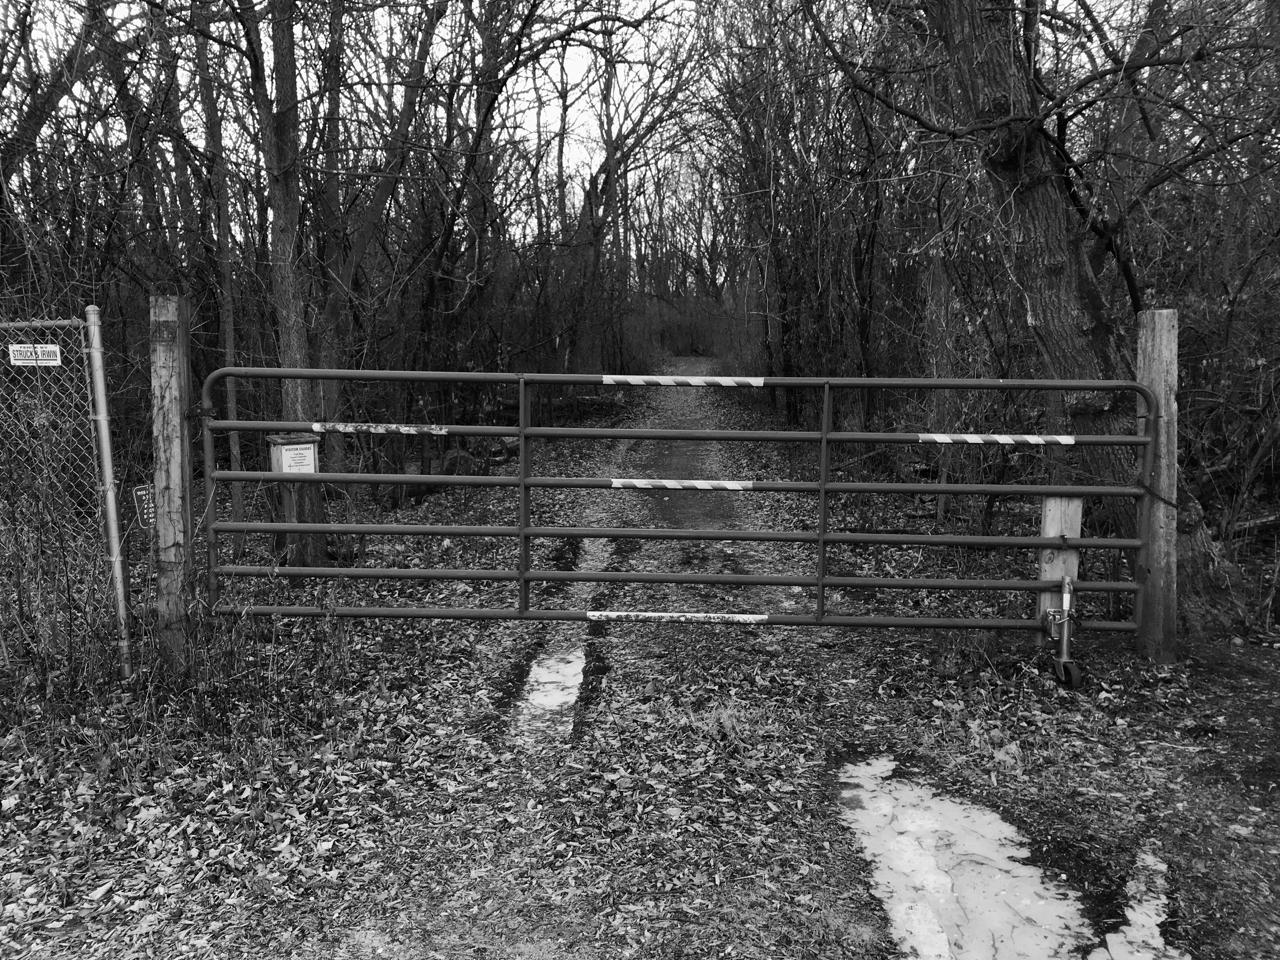 Before the Gate. UW Arboretum. Madison, Wisconsin. January 2018 © William D. Walker